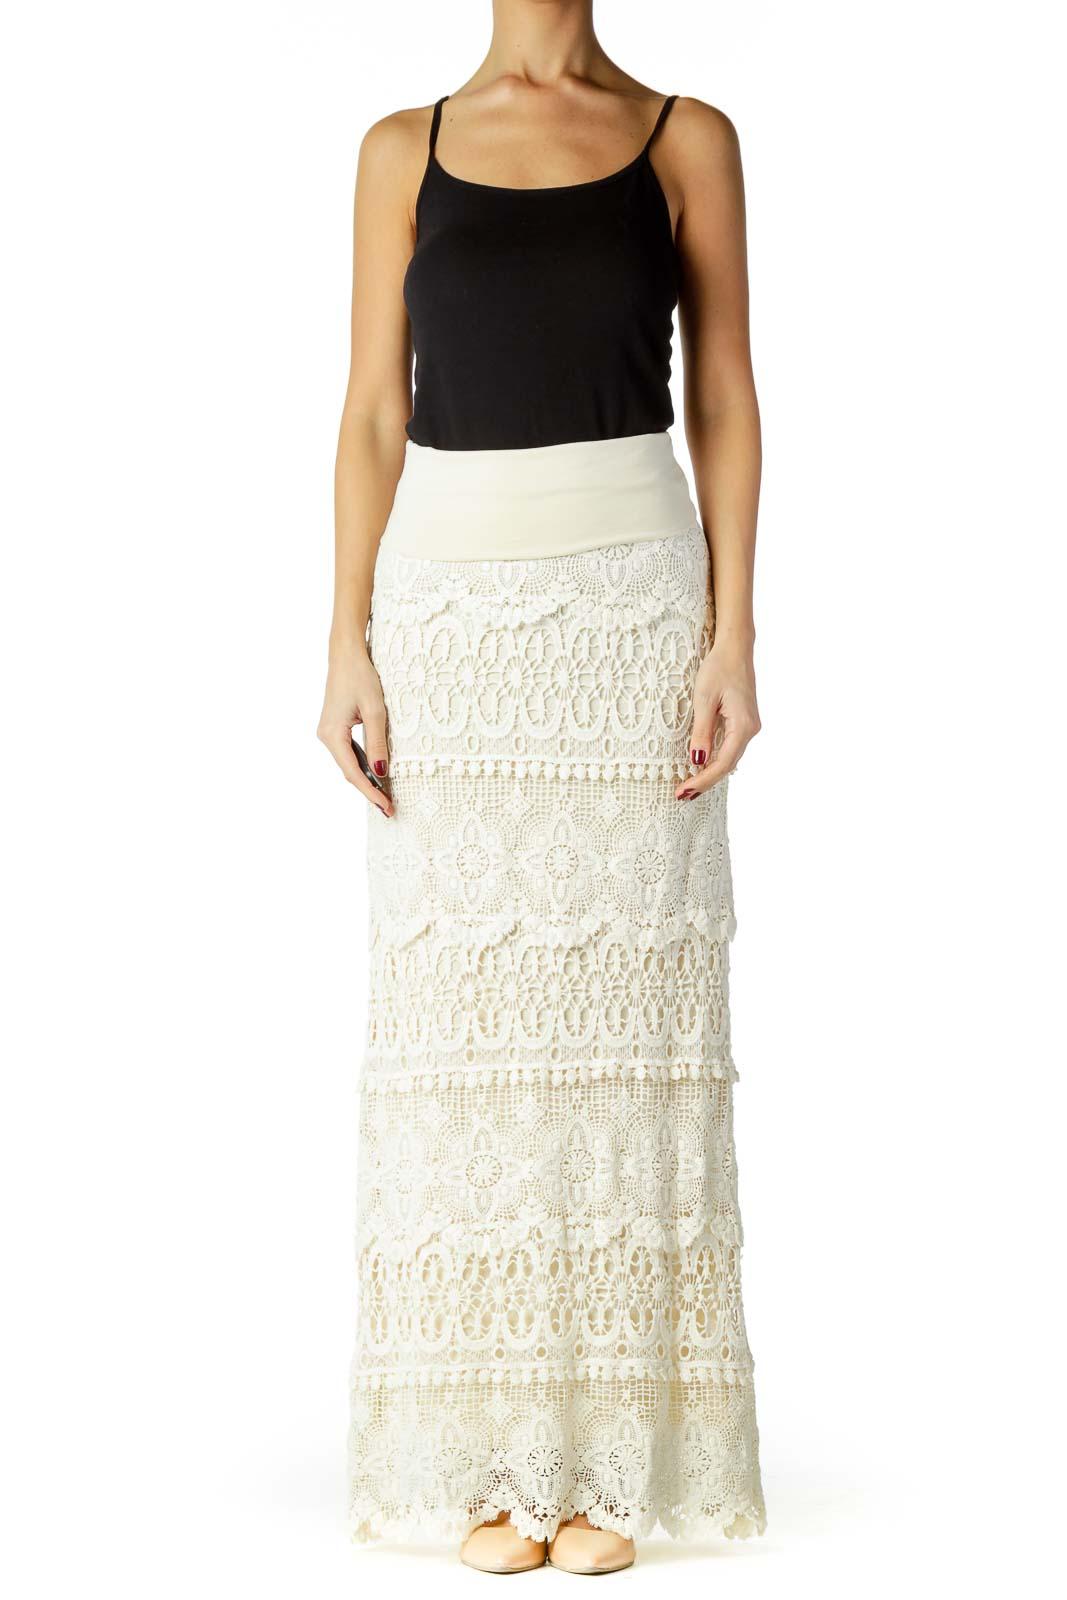 Beige Crocheted Maxi Skirt